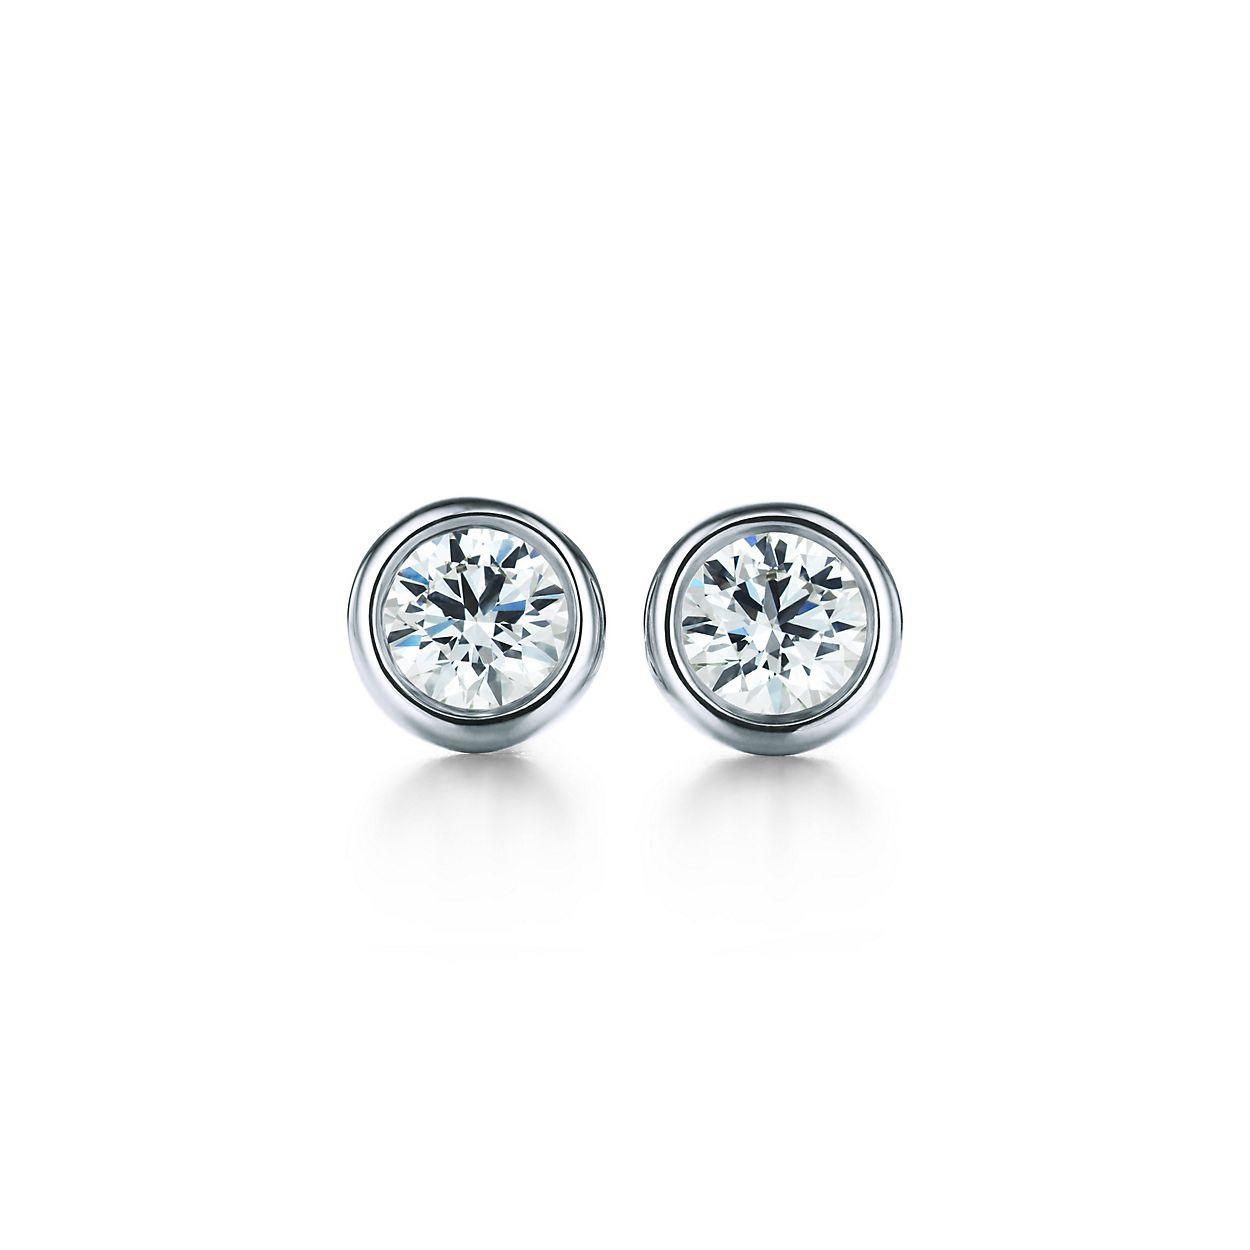 Elsa Peretti Diamonds By The Yard Br Earrings